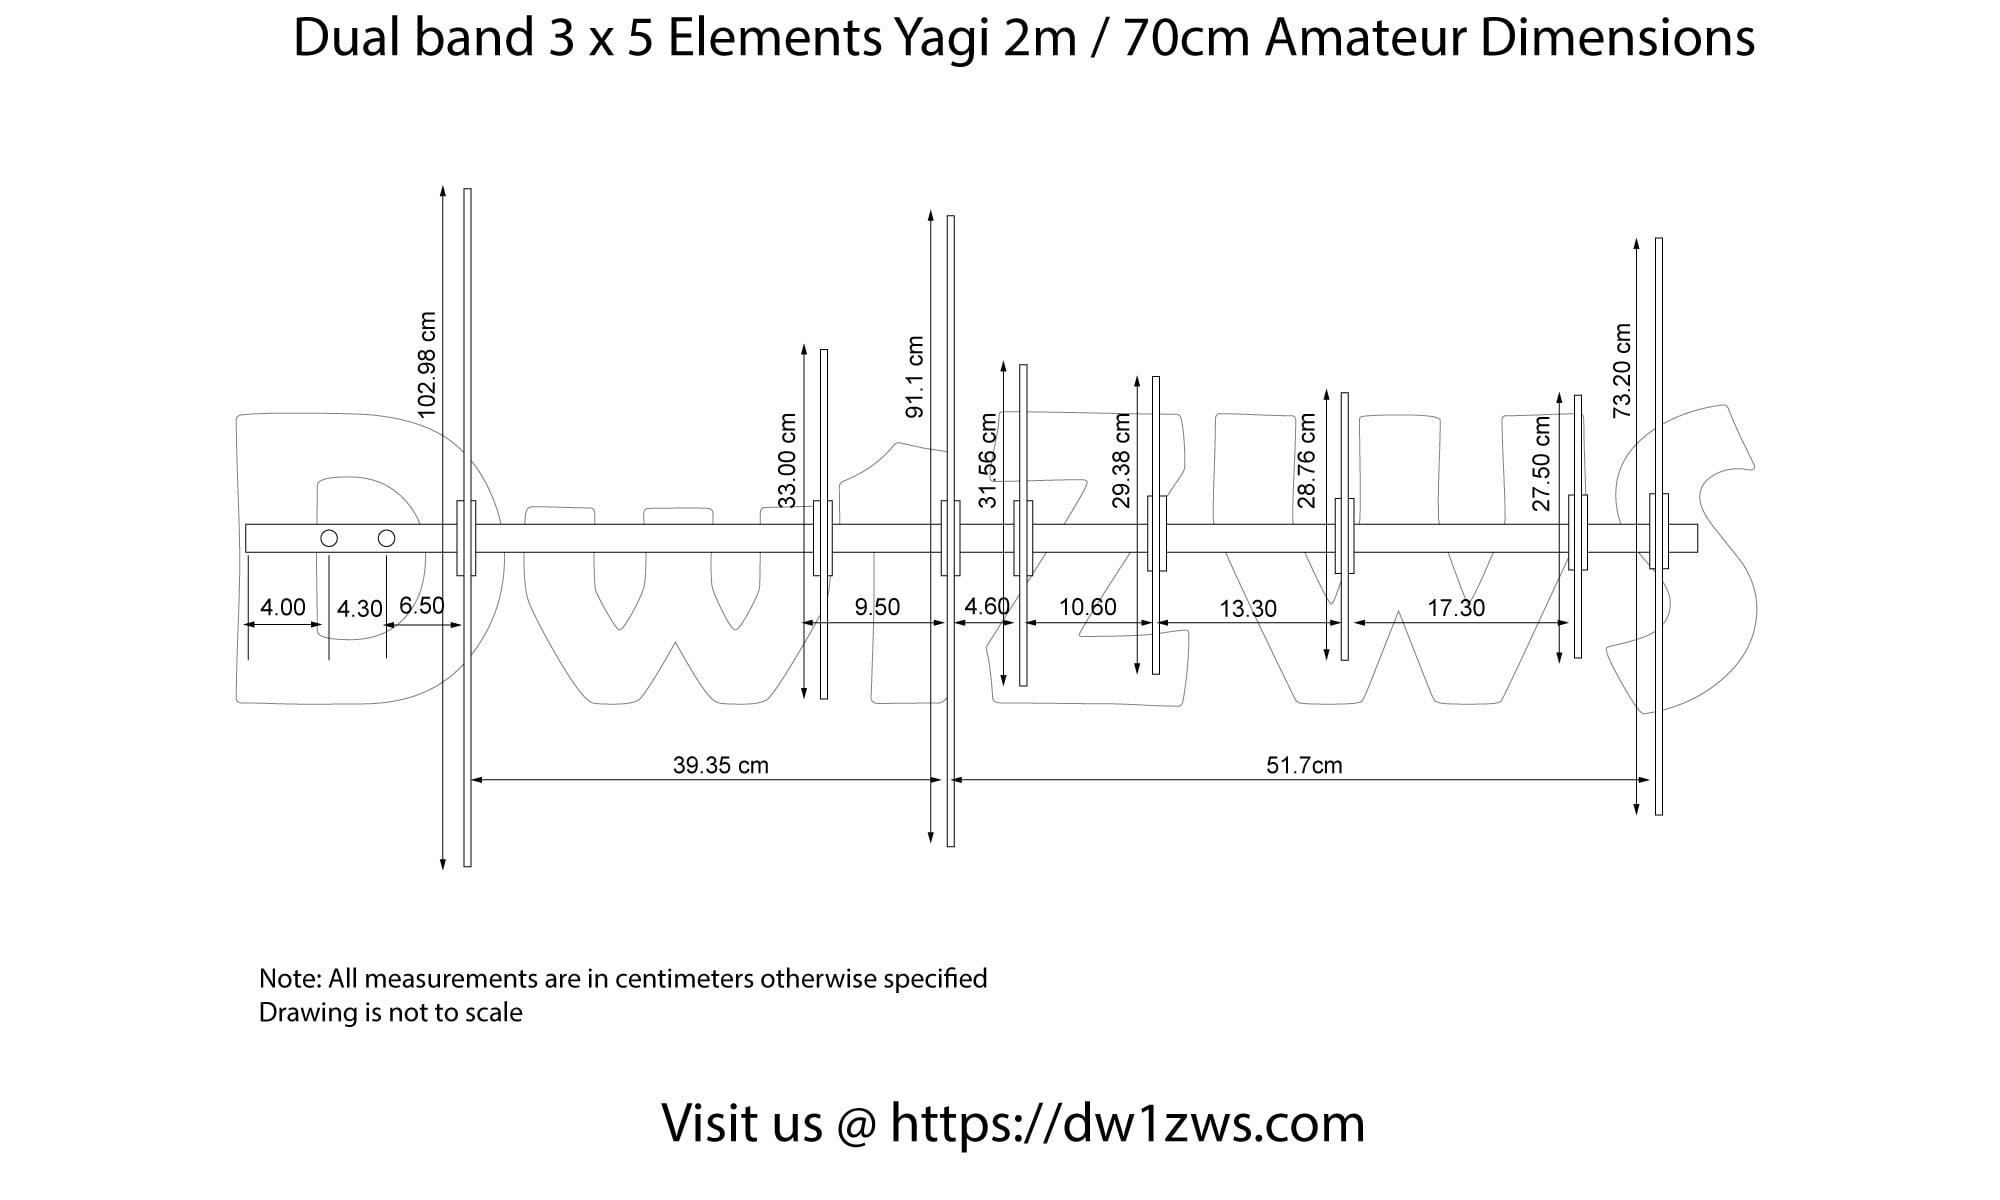 Build the 3 x 5 Elements 2m/70cm Dualband Yagi   DW1ZWS